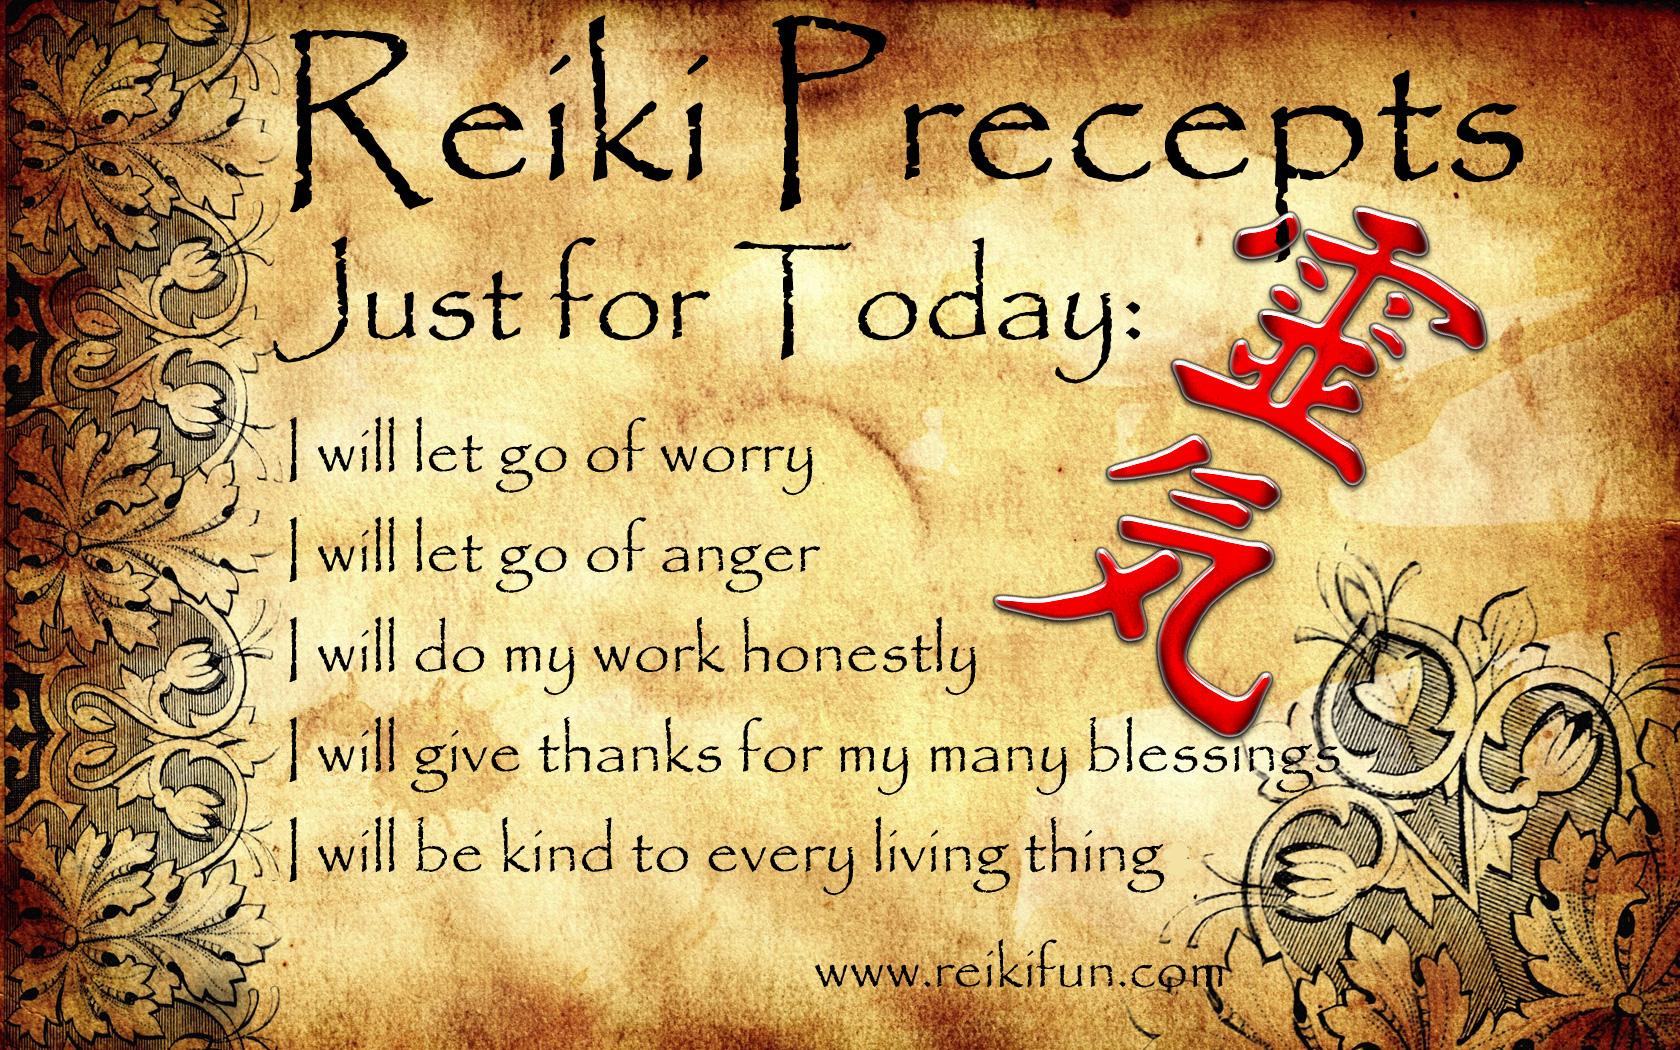 Reiki - Providence Life Coaching & Reiki Counseling - Swerdloff